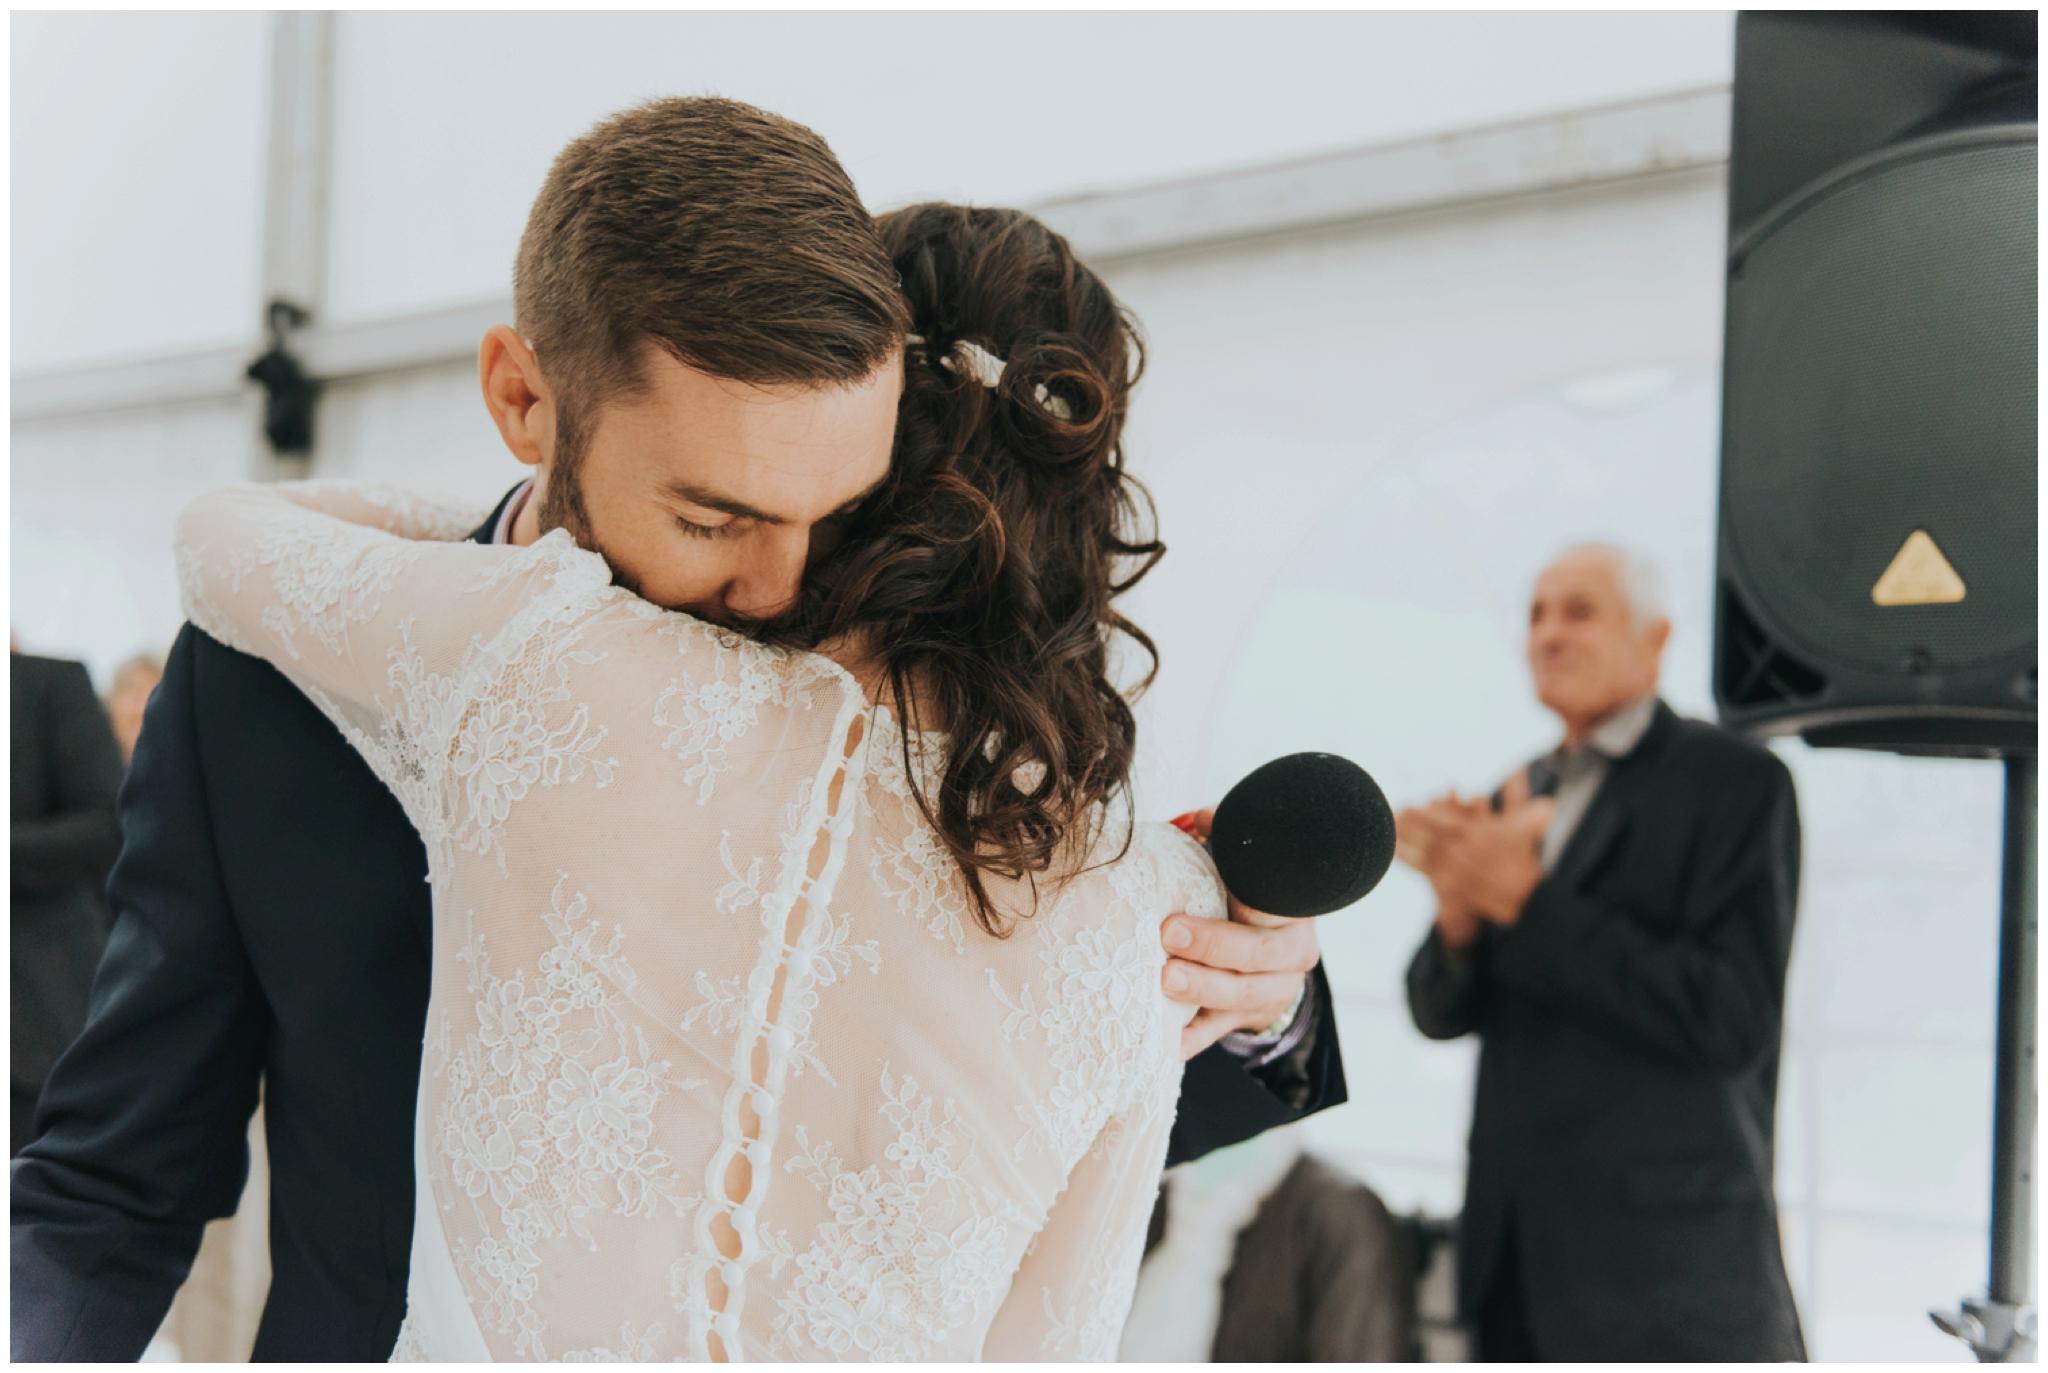 photographe-mariage-montagne-vercors-boho-folk-grenoble-annecy-alpes_0053